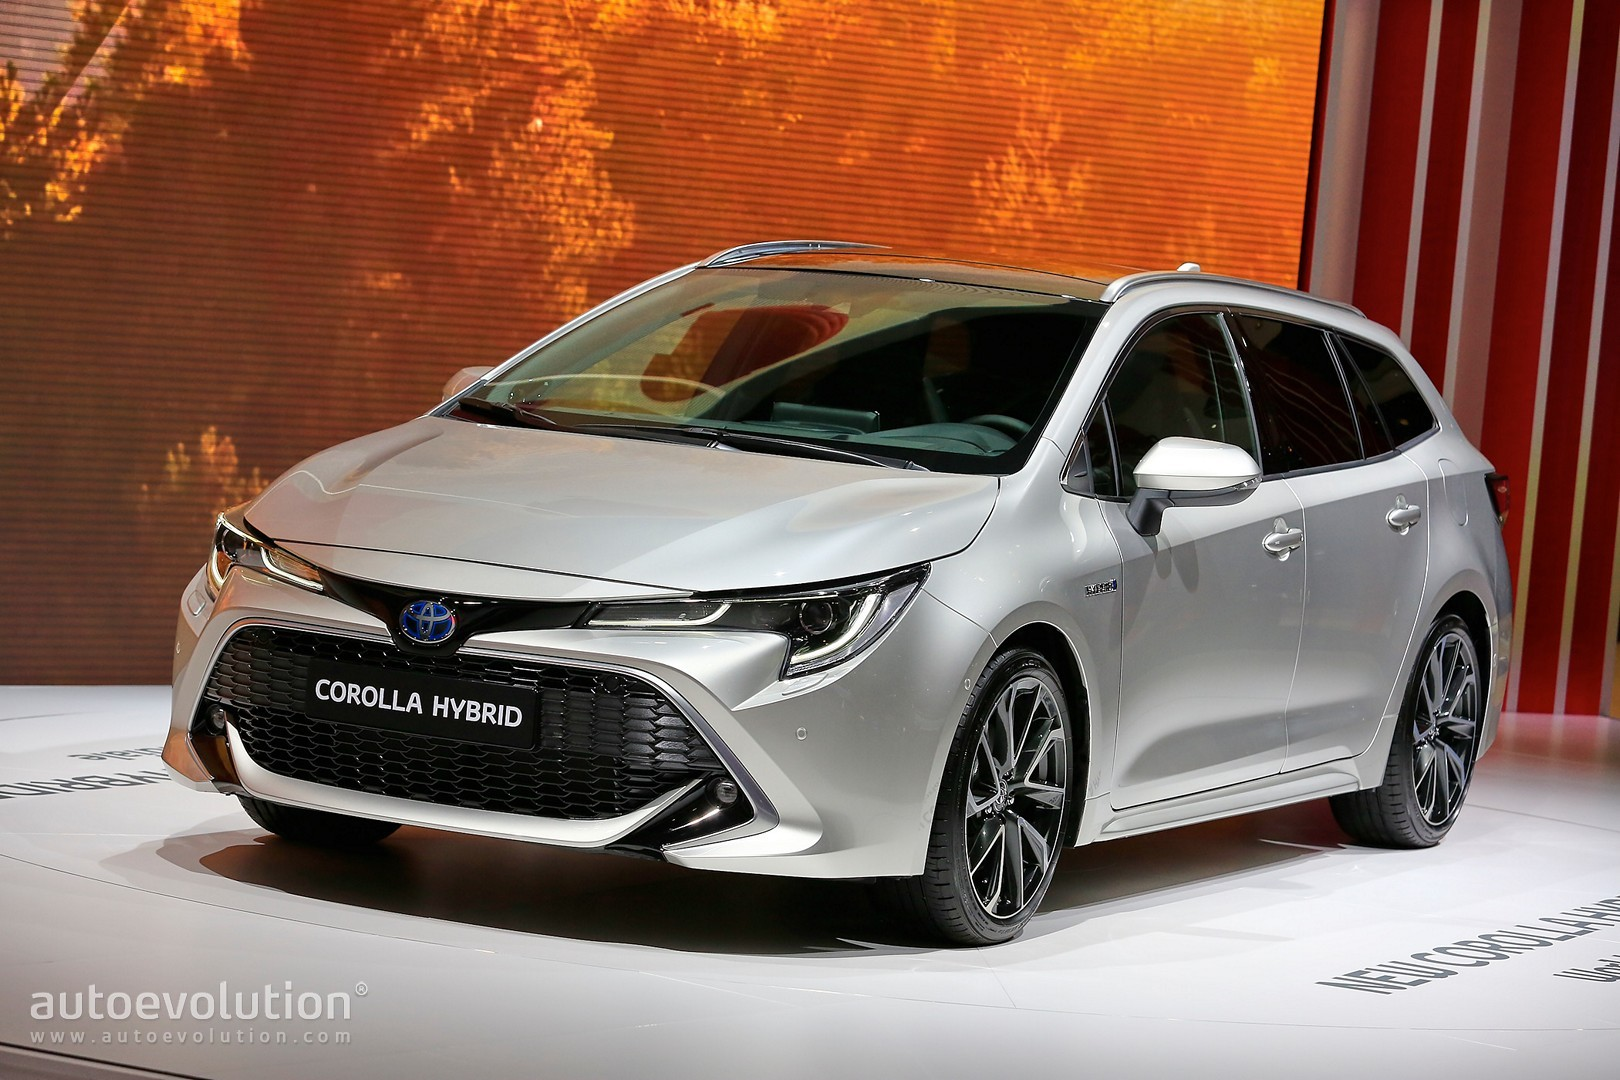 How to Fix Overheating Engine on Toyota Corolla - autoevolution